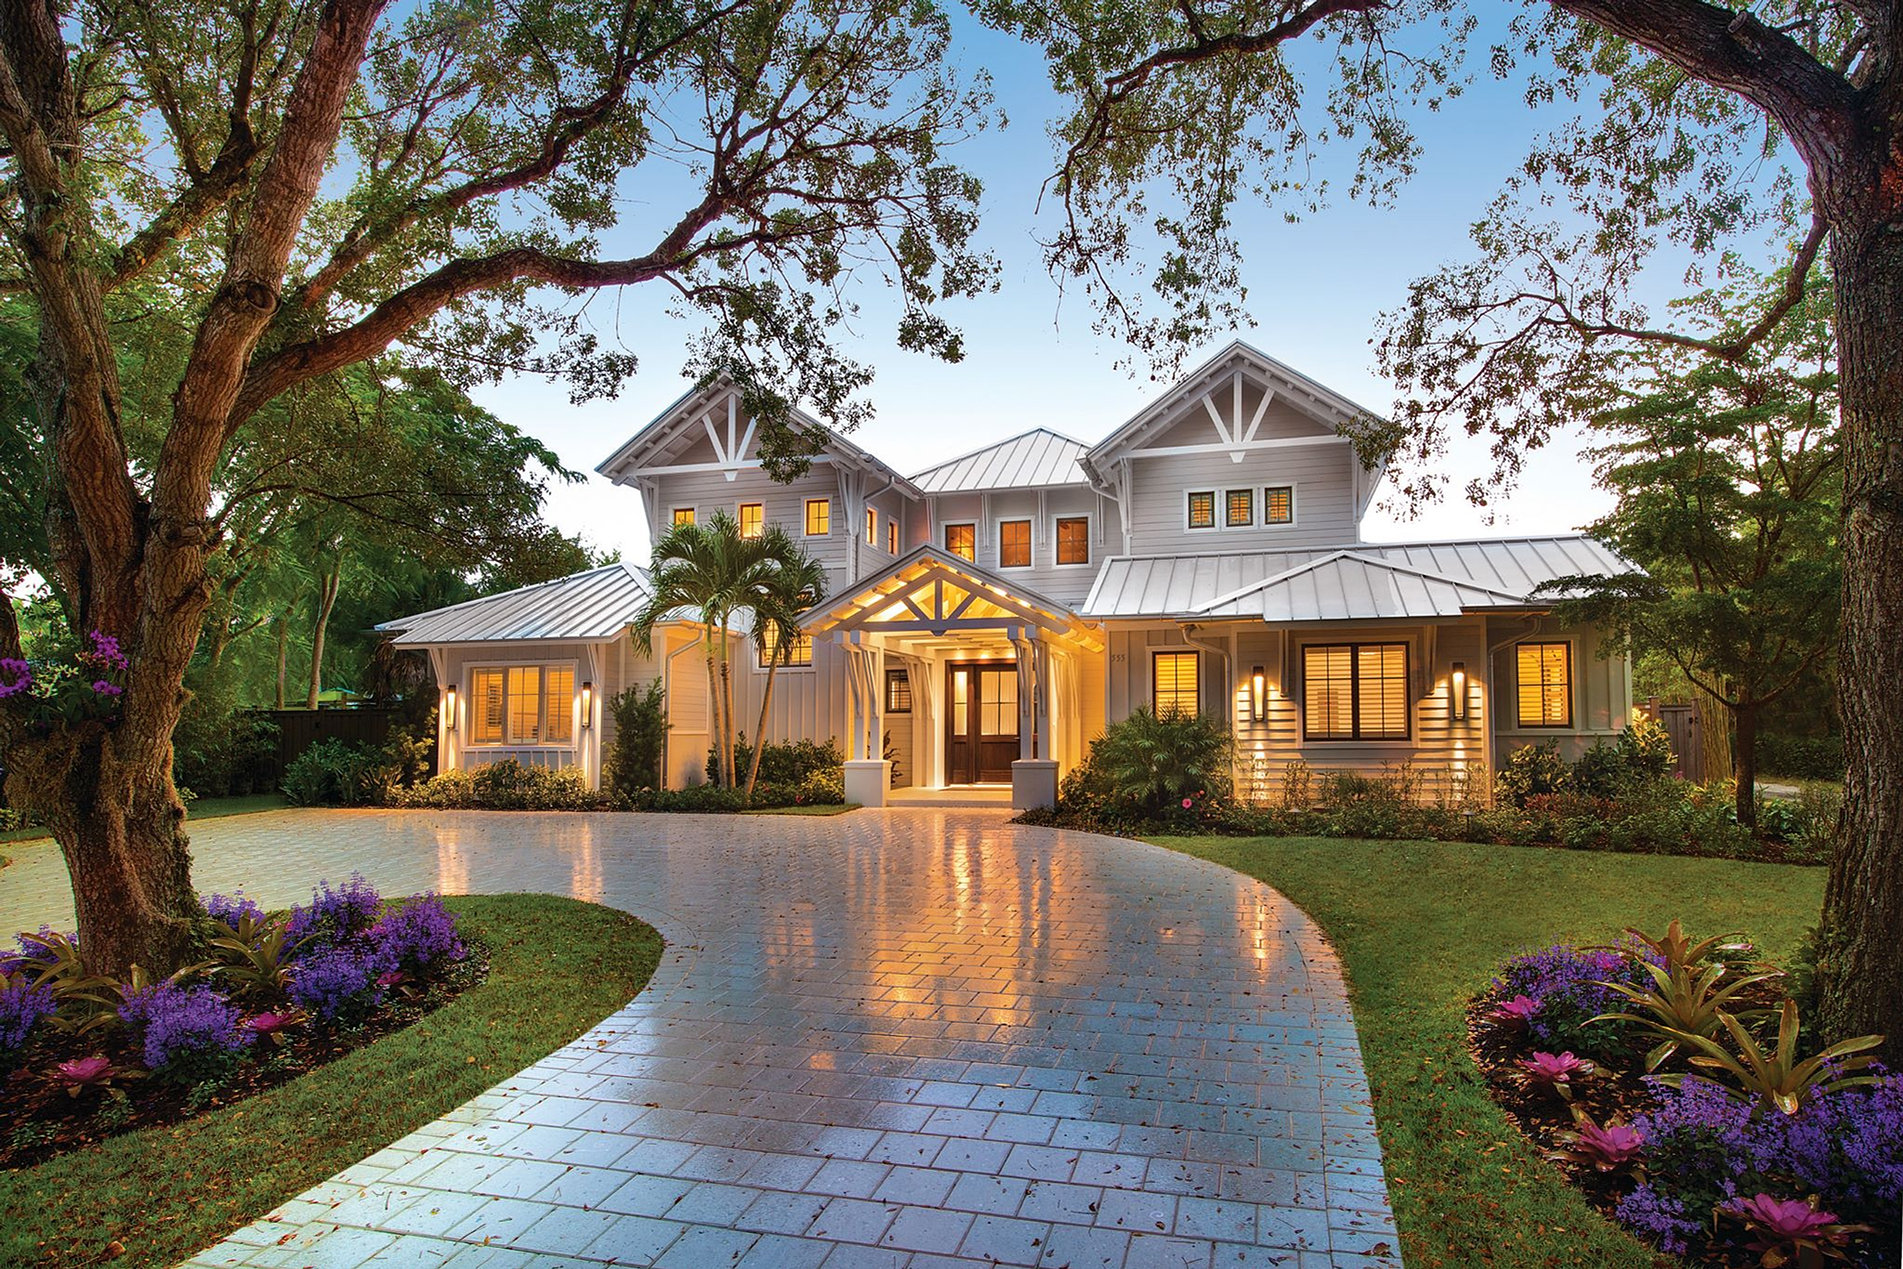 Luxury Homes: Big Island Builders, Inc